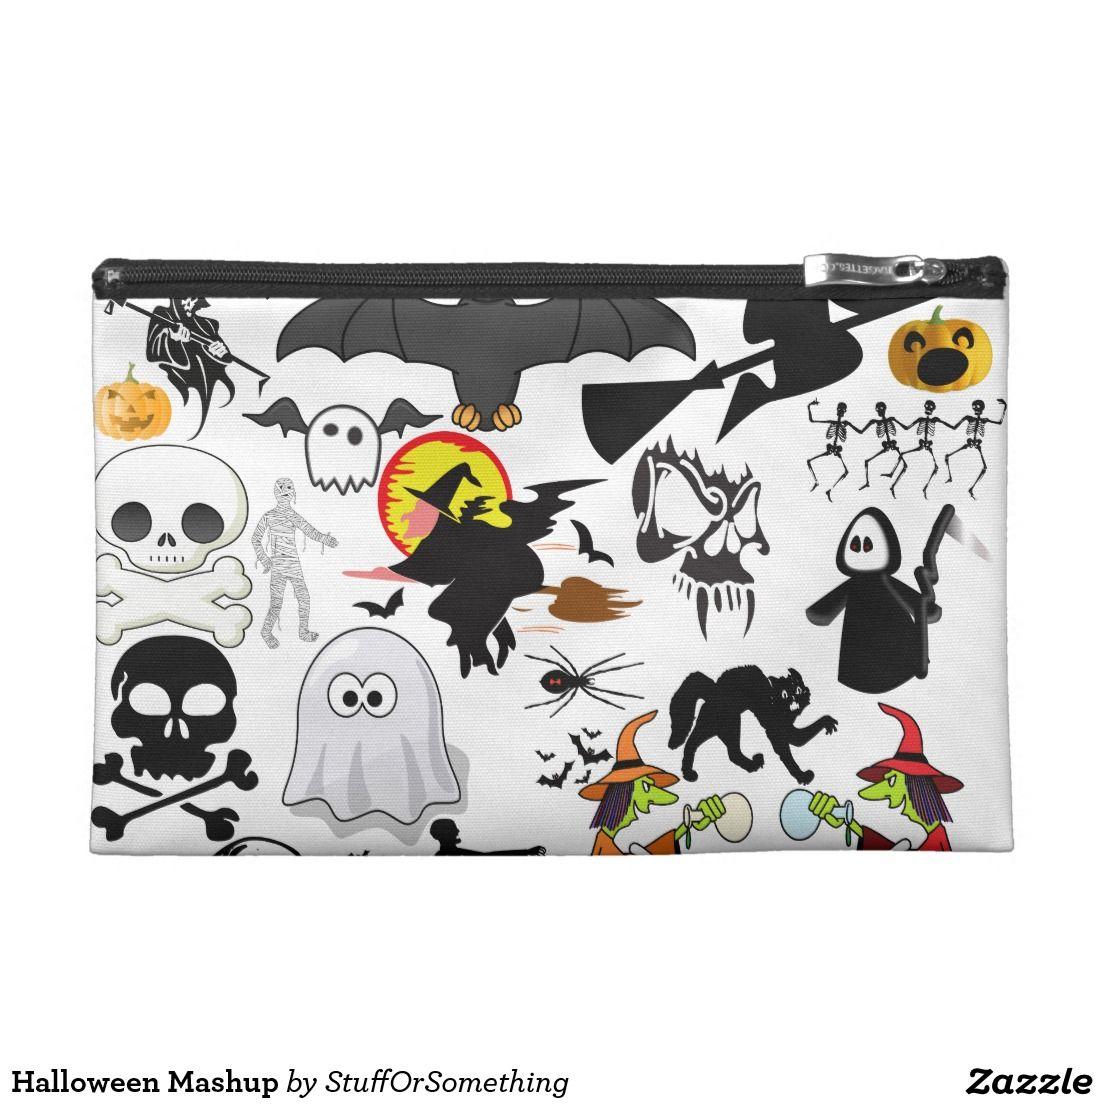 Halloween Mashup Travel Accessory Bag